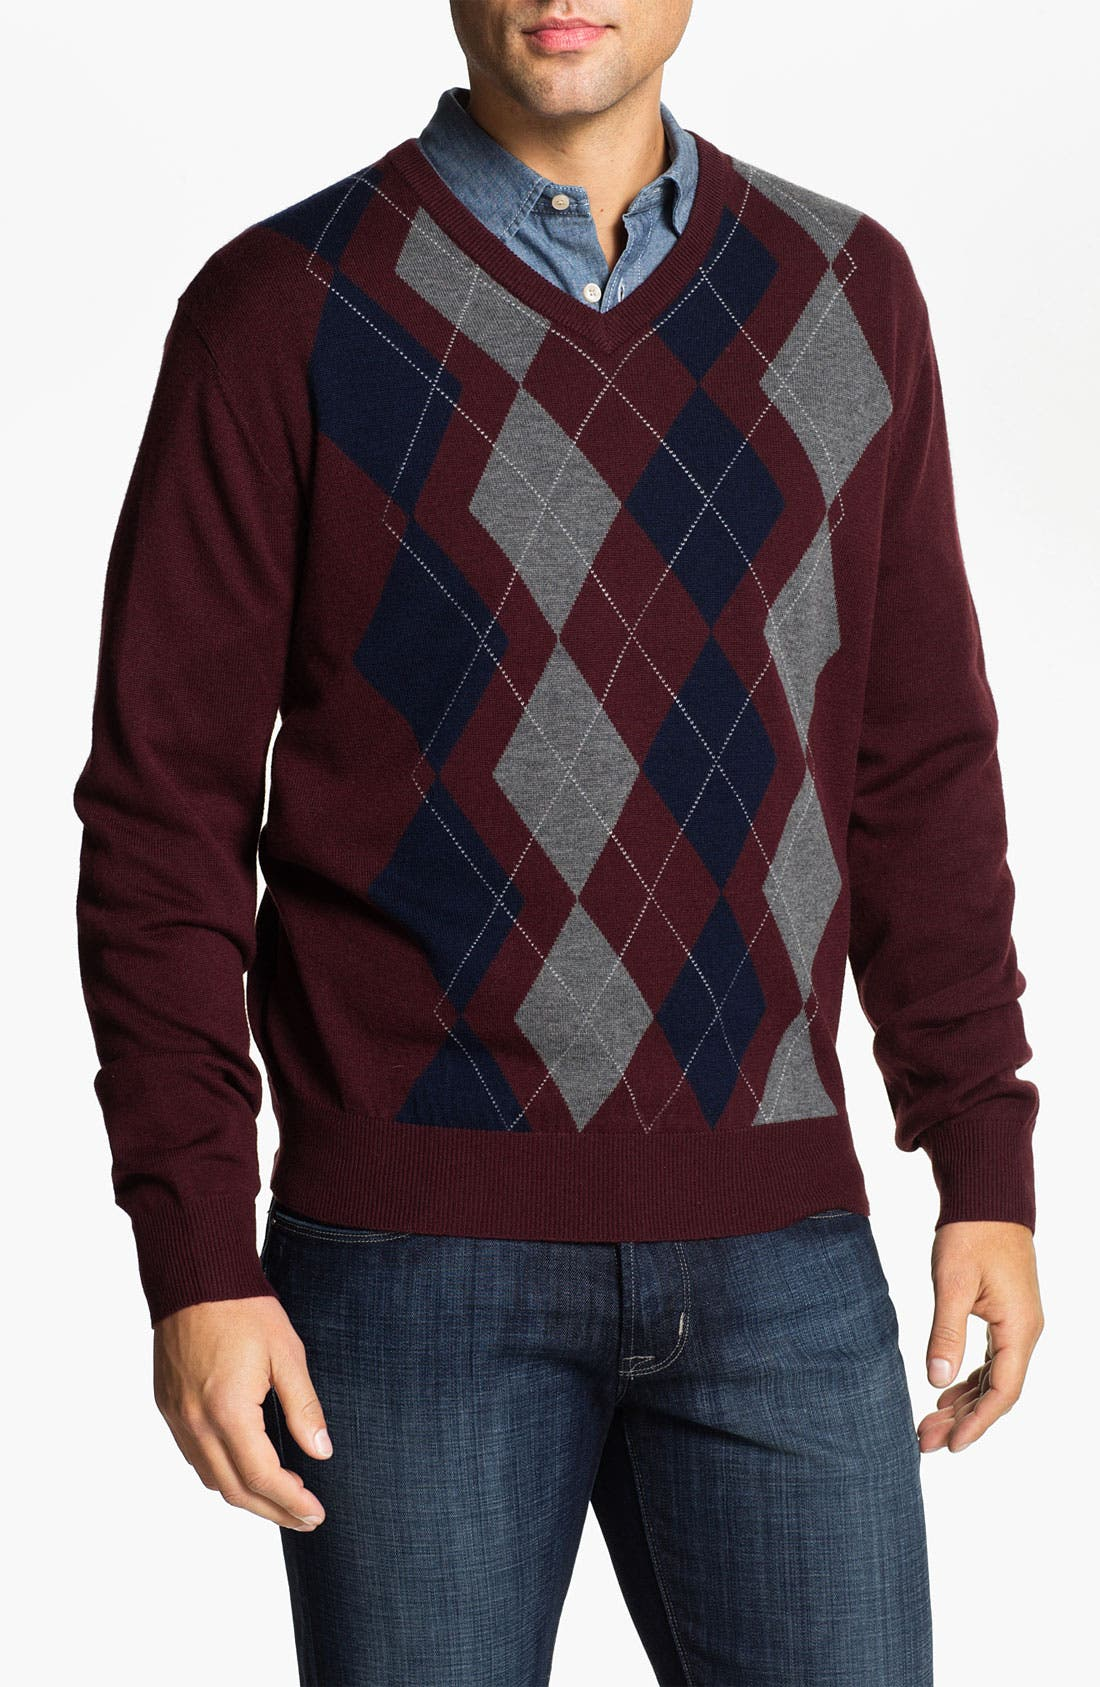 Main Image - Toscano Merino Wool Blend V-Neck Sweater